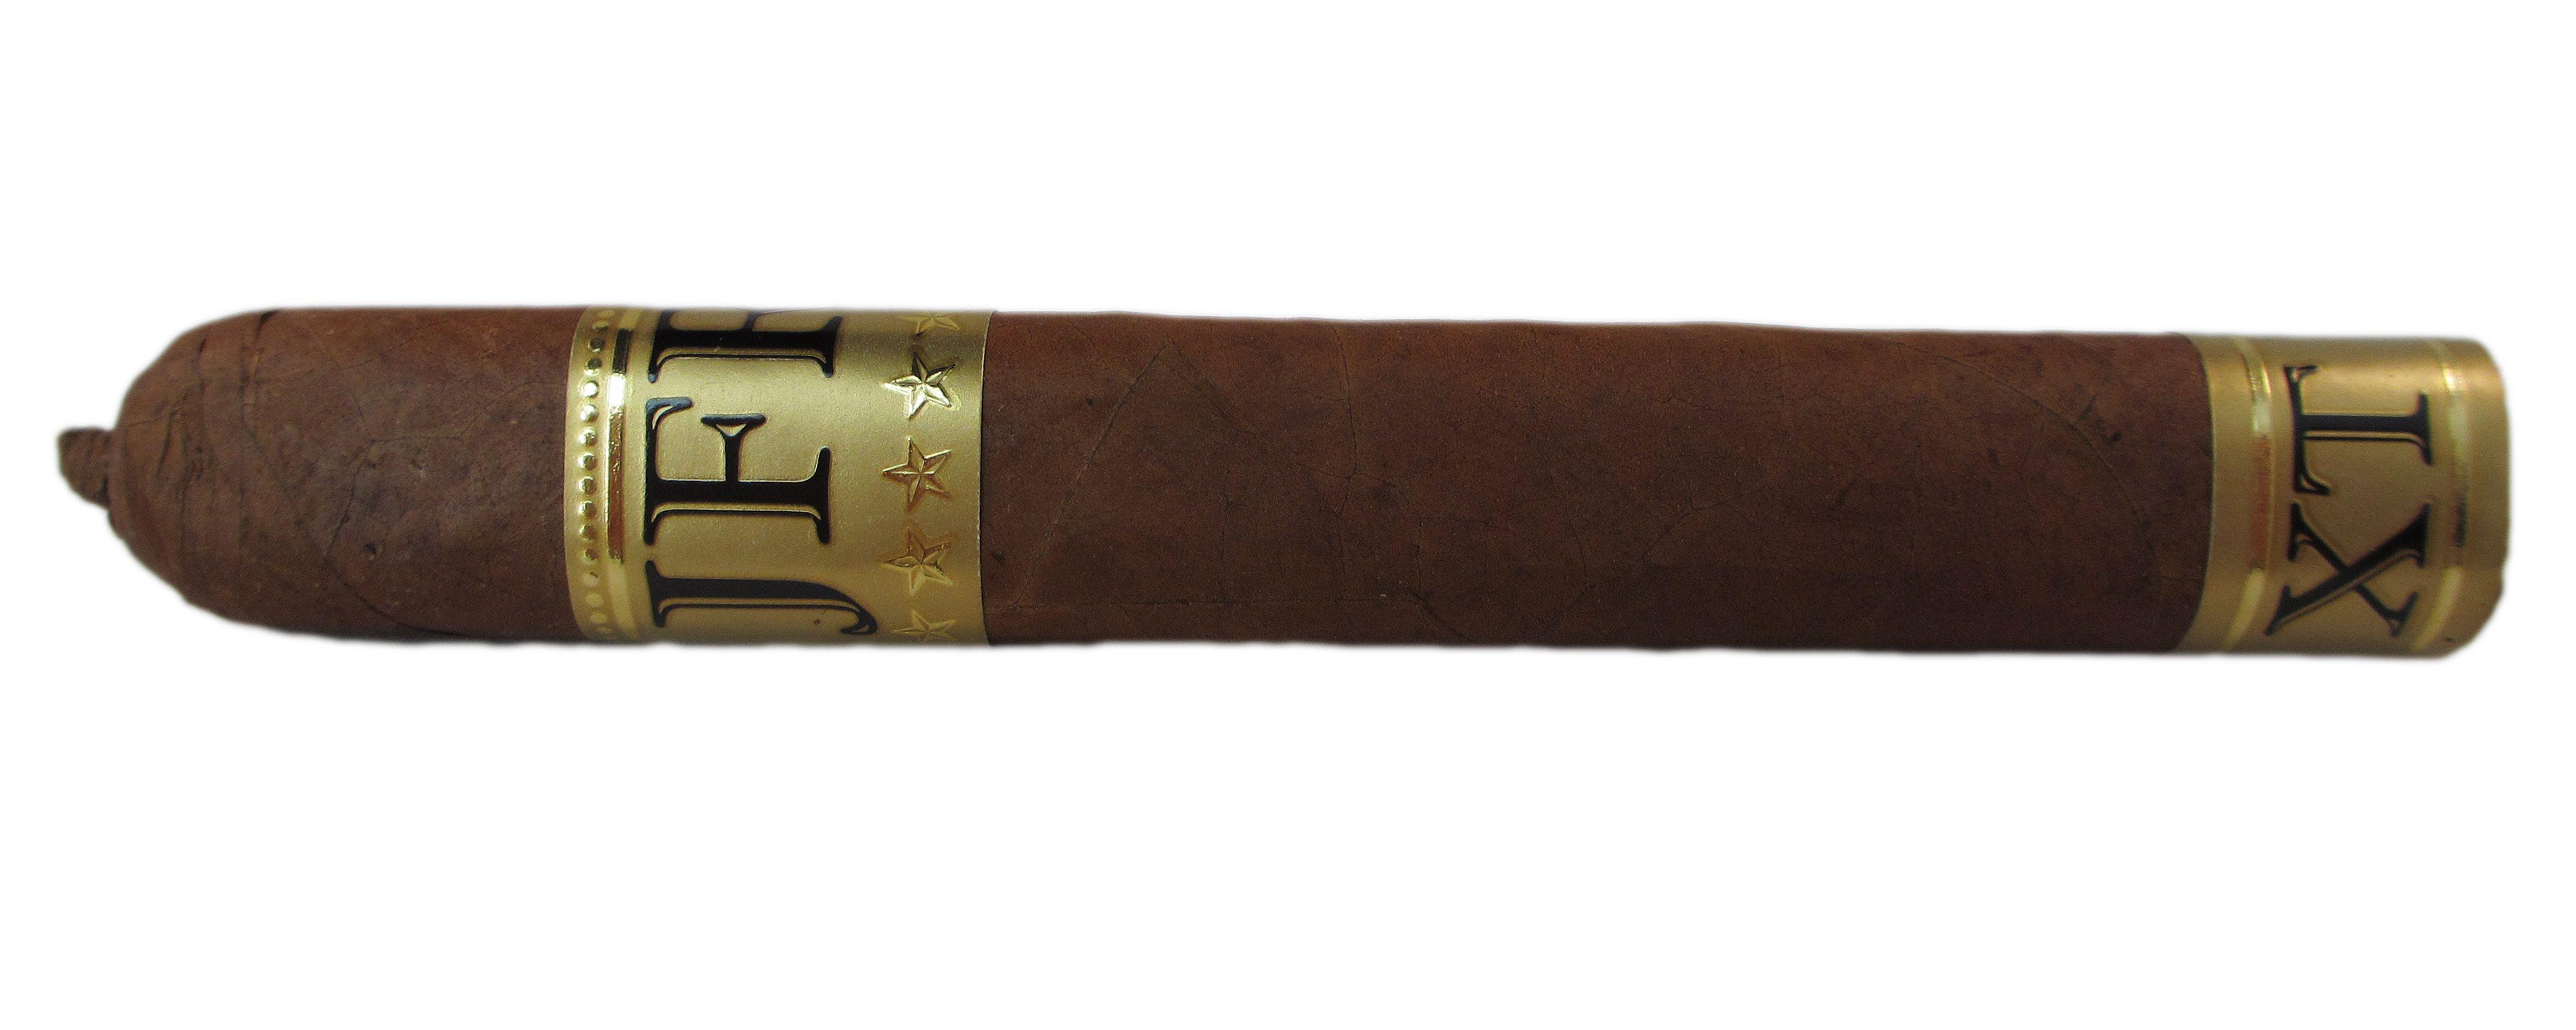 Blind Cigar Review: Casa Fernandez | JFR XT Corojo Toro